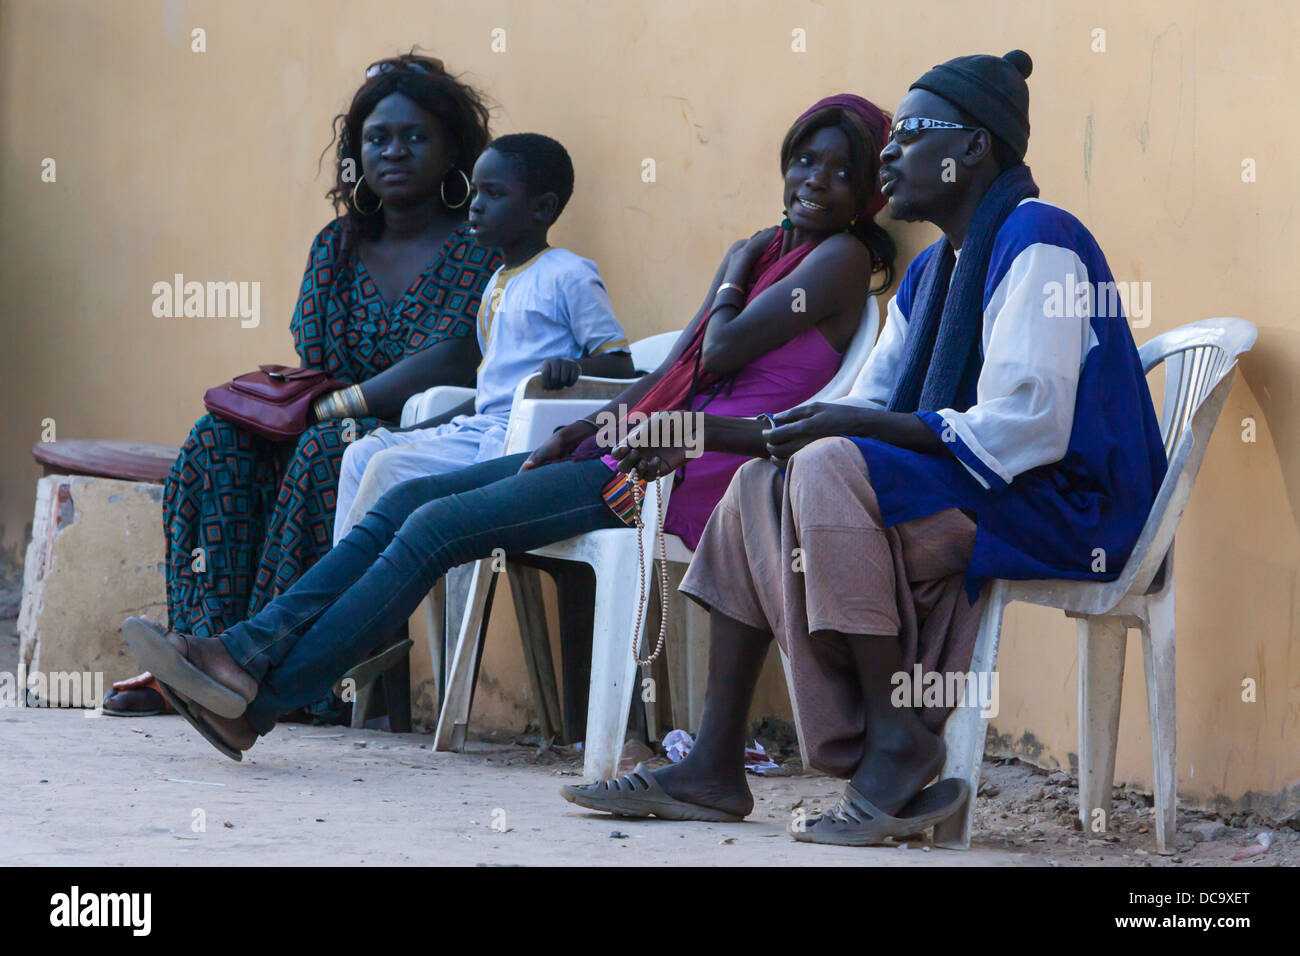 Senegal People Stock Photos & Senegal People Stock Images